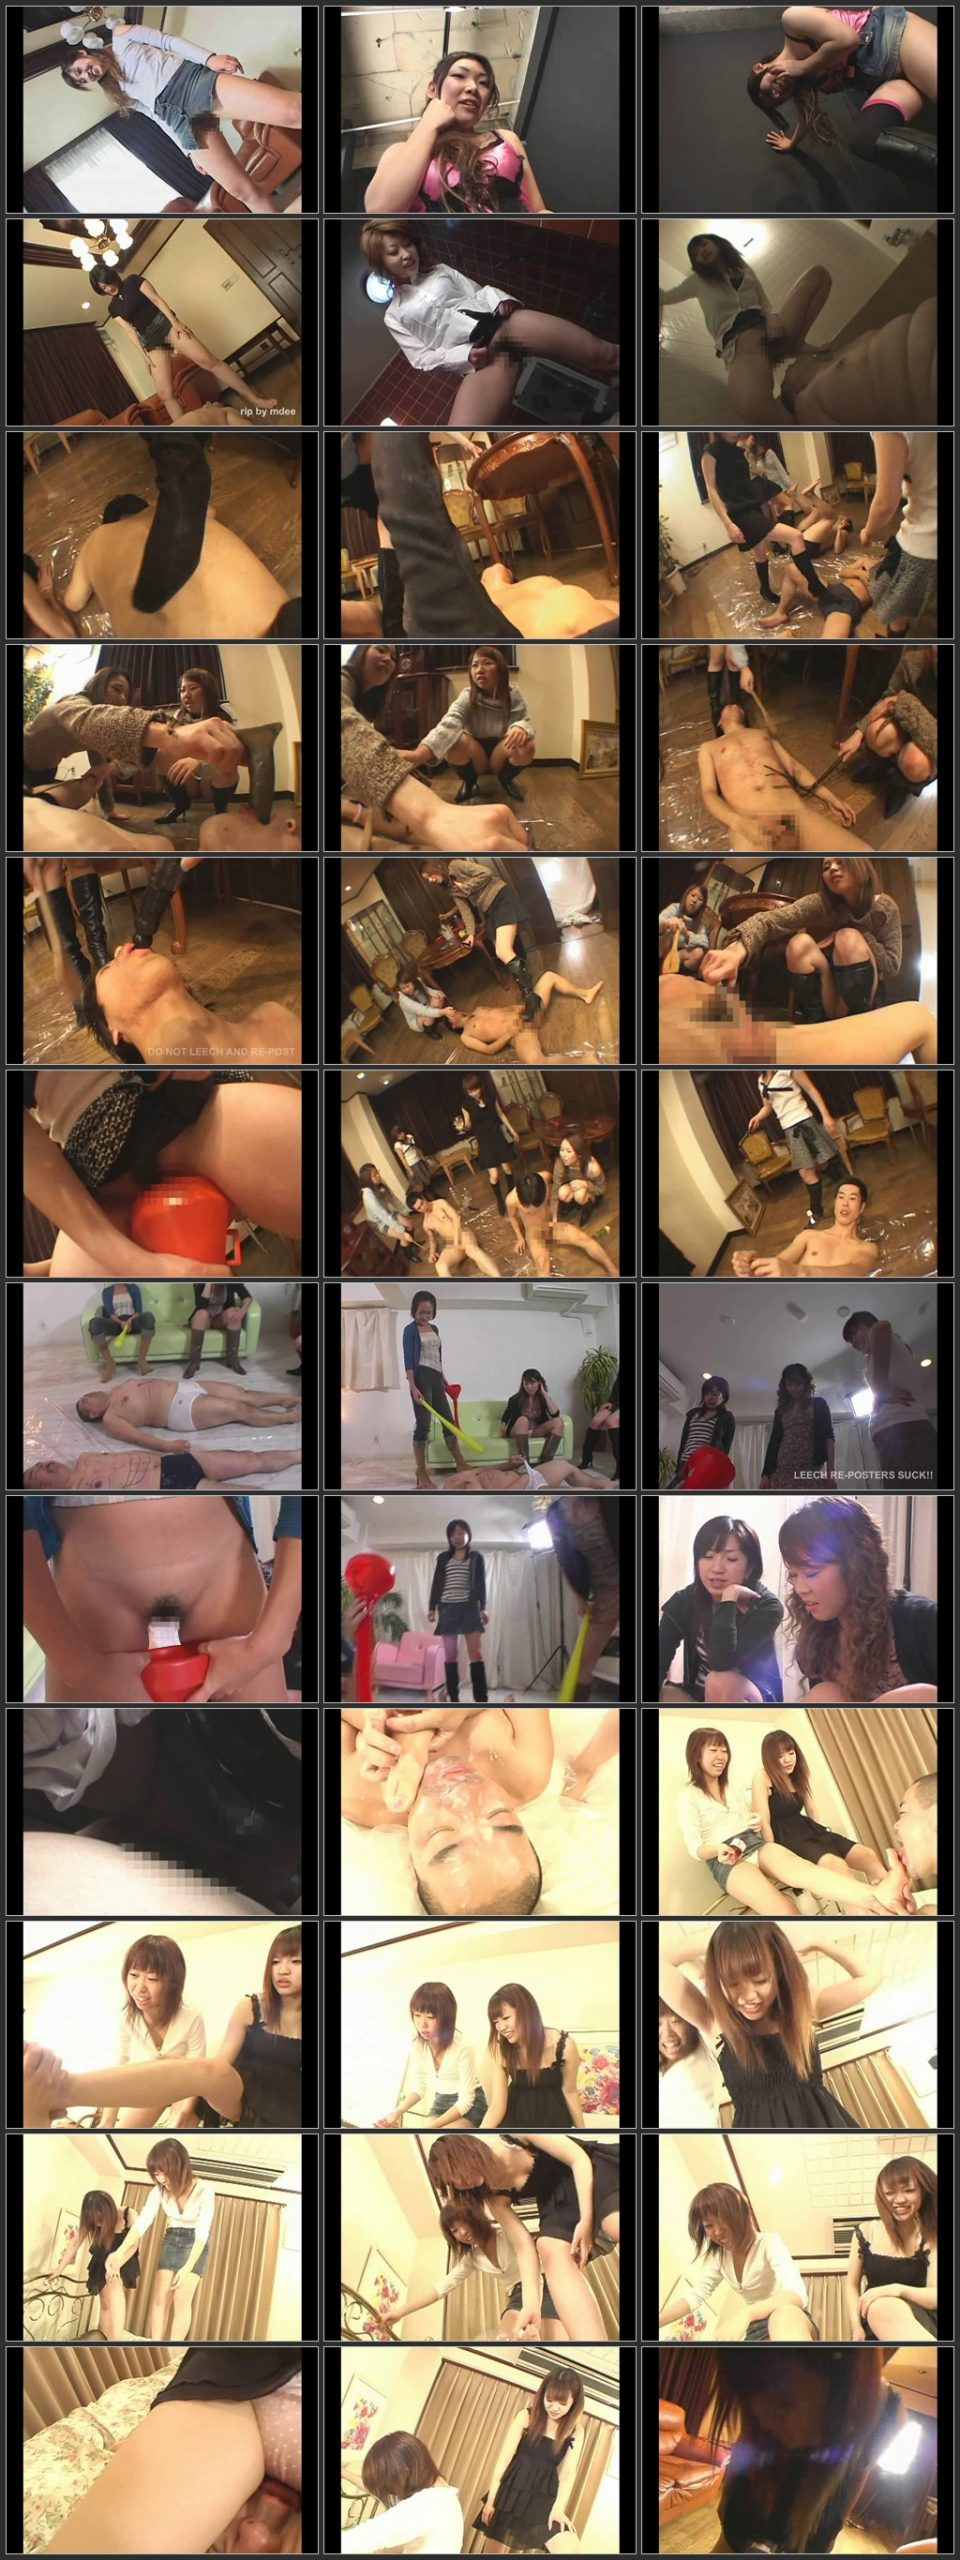 HKD 08 t scaled - [HKD-08] - アンモニア飲尿調教辱め 調教 女王様・M男 その他女王・SM スカトロ 放尿 スカトロ 飲尿